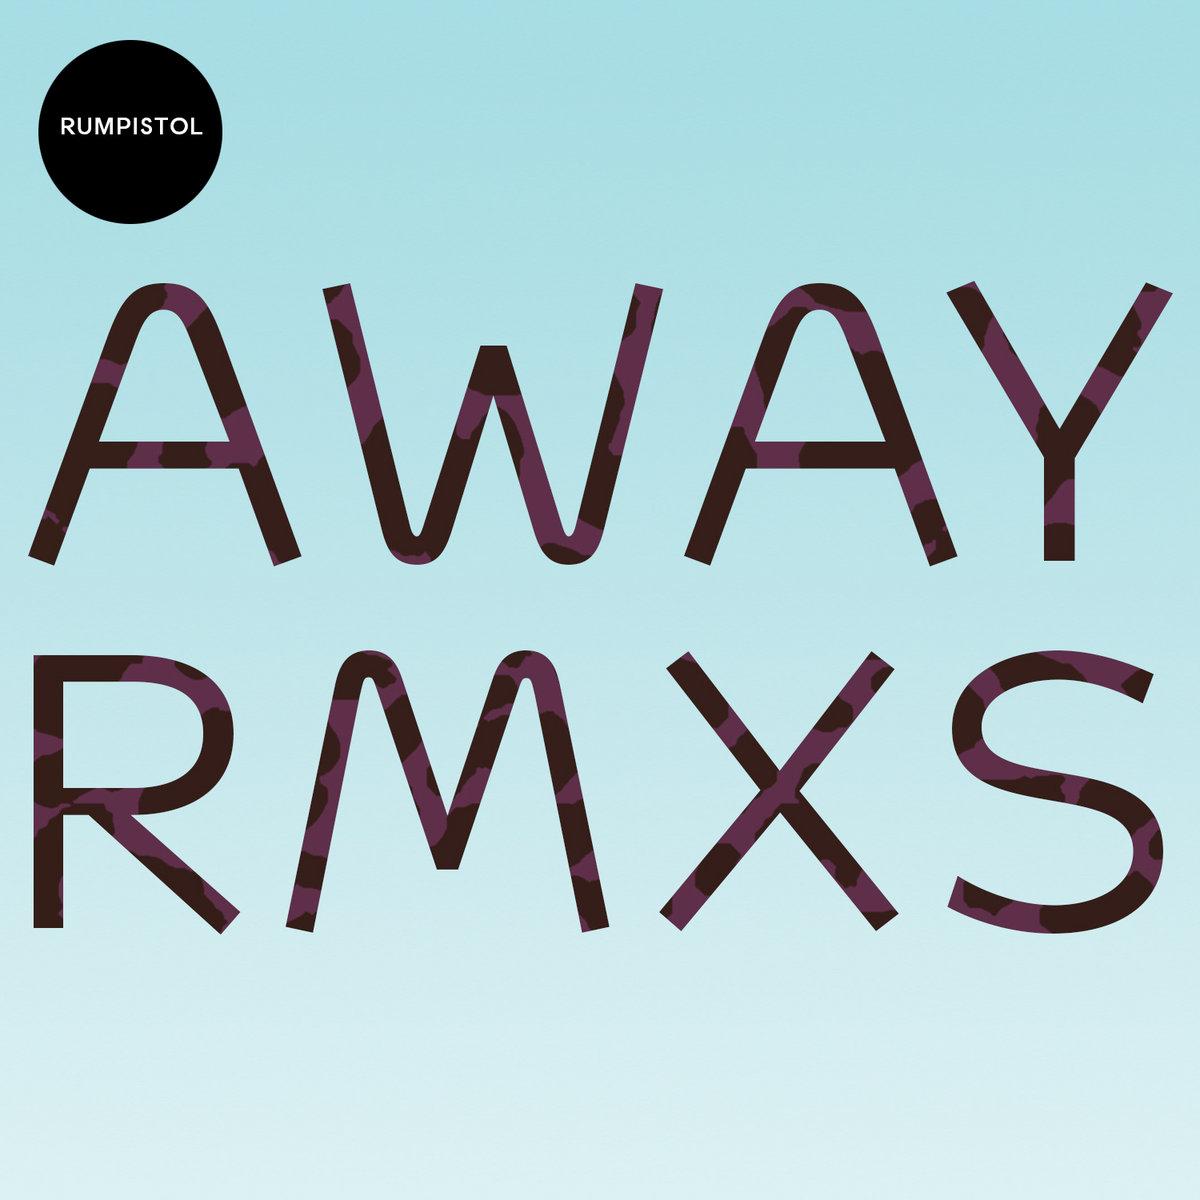 Rumpistol - Away Rmxs artwork